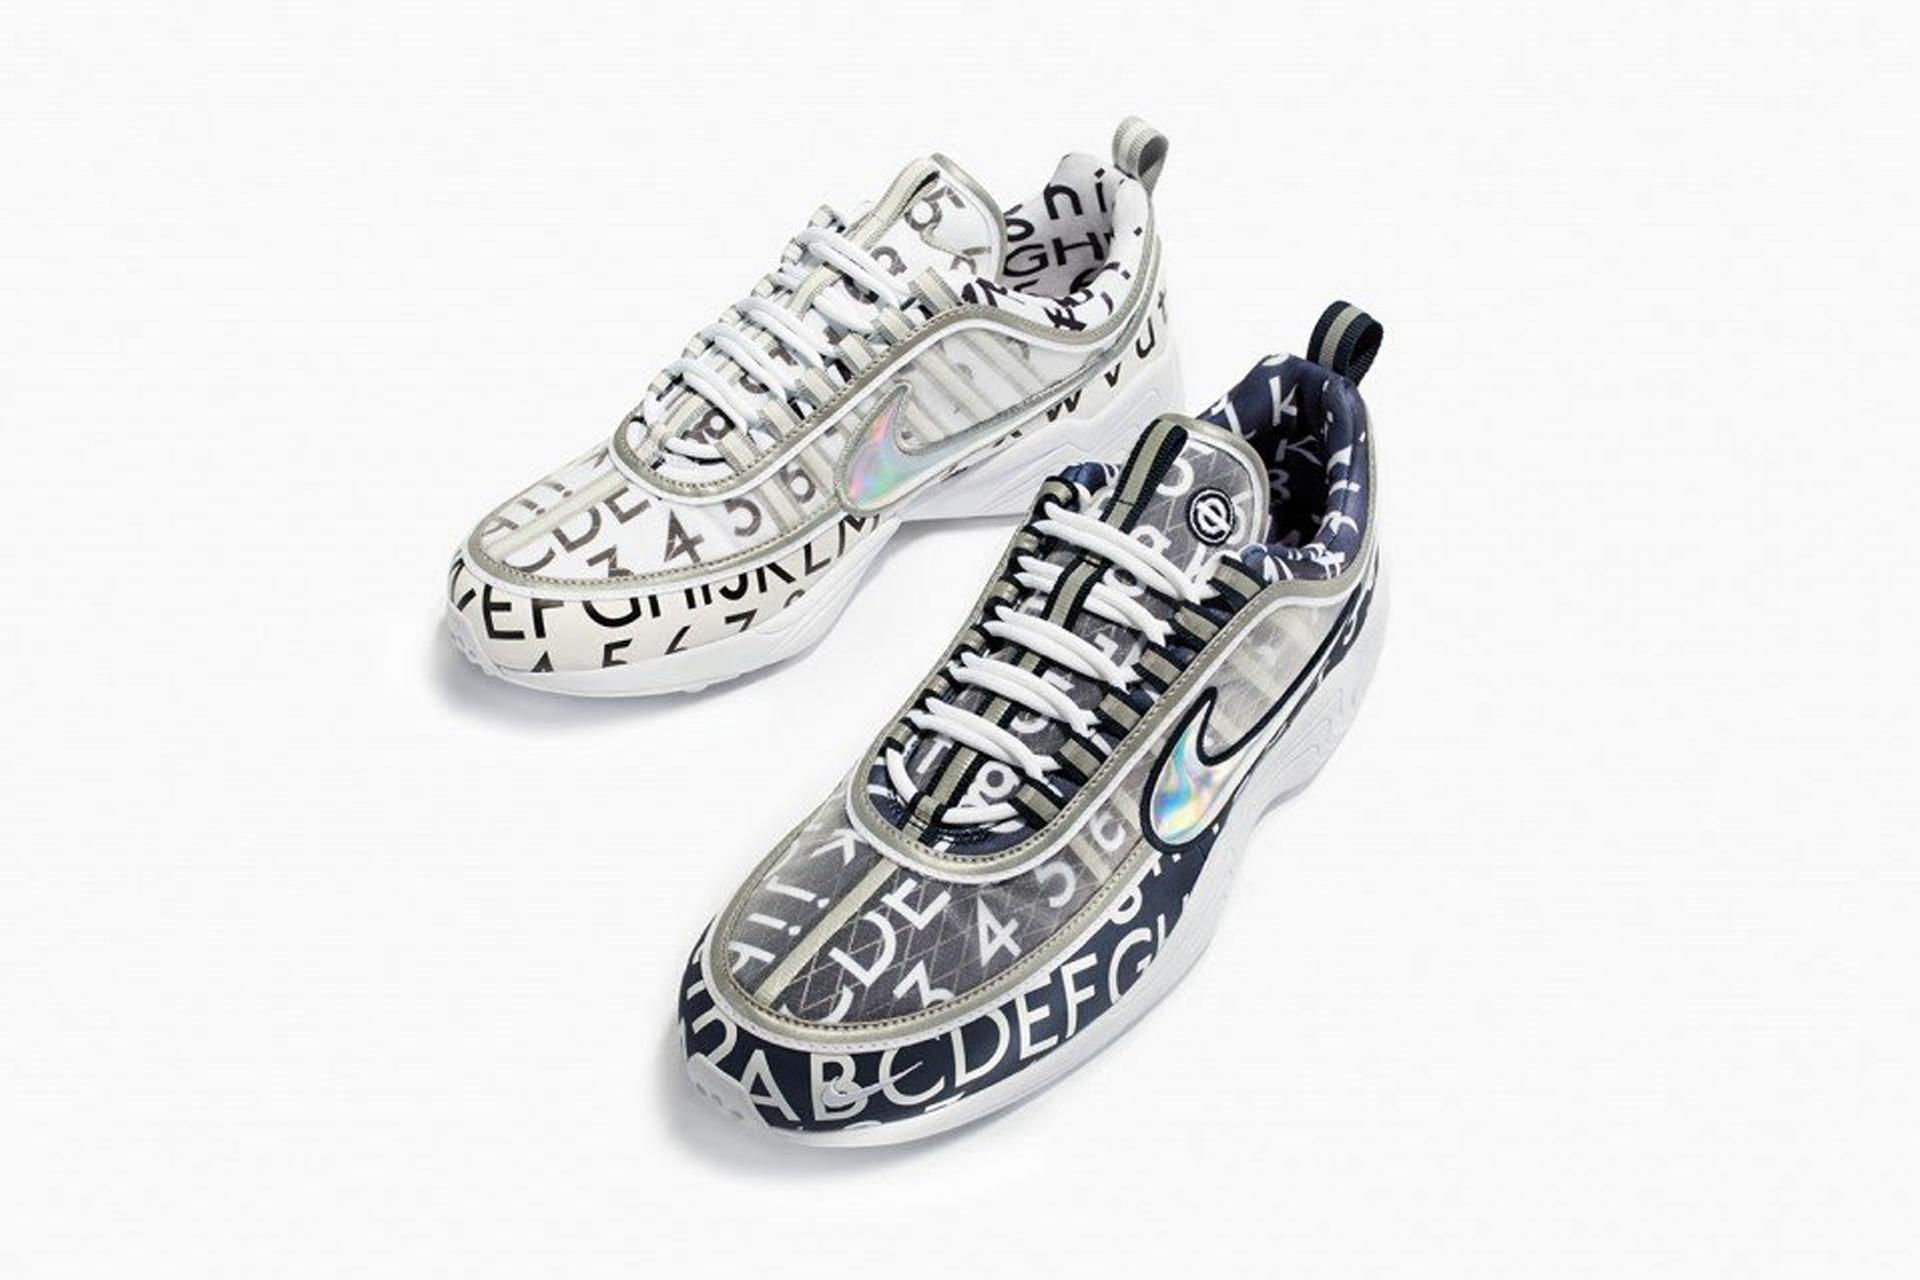 NikeLab x Roundel Spiridon Pack.